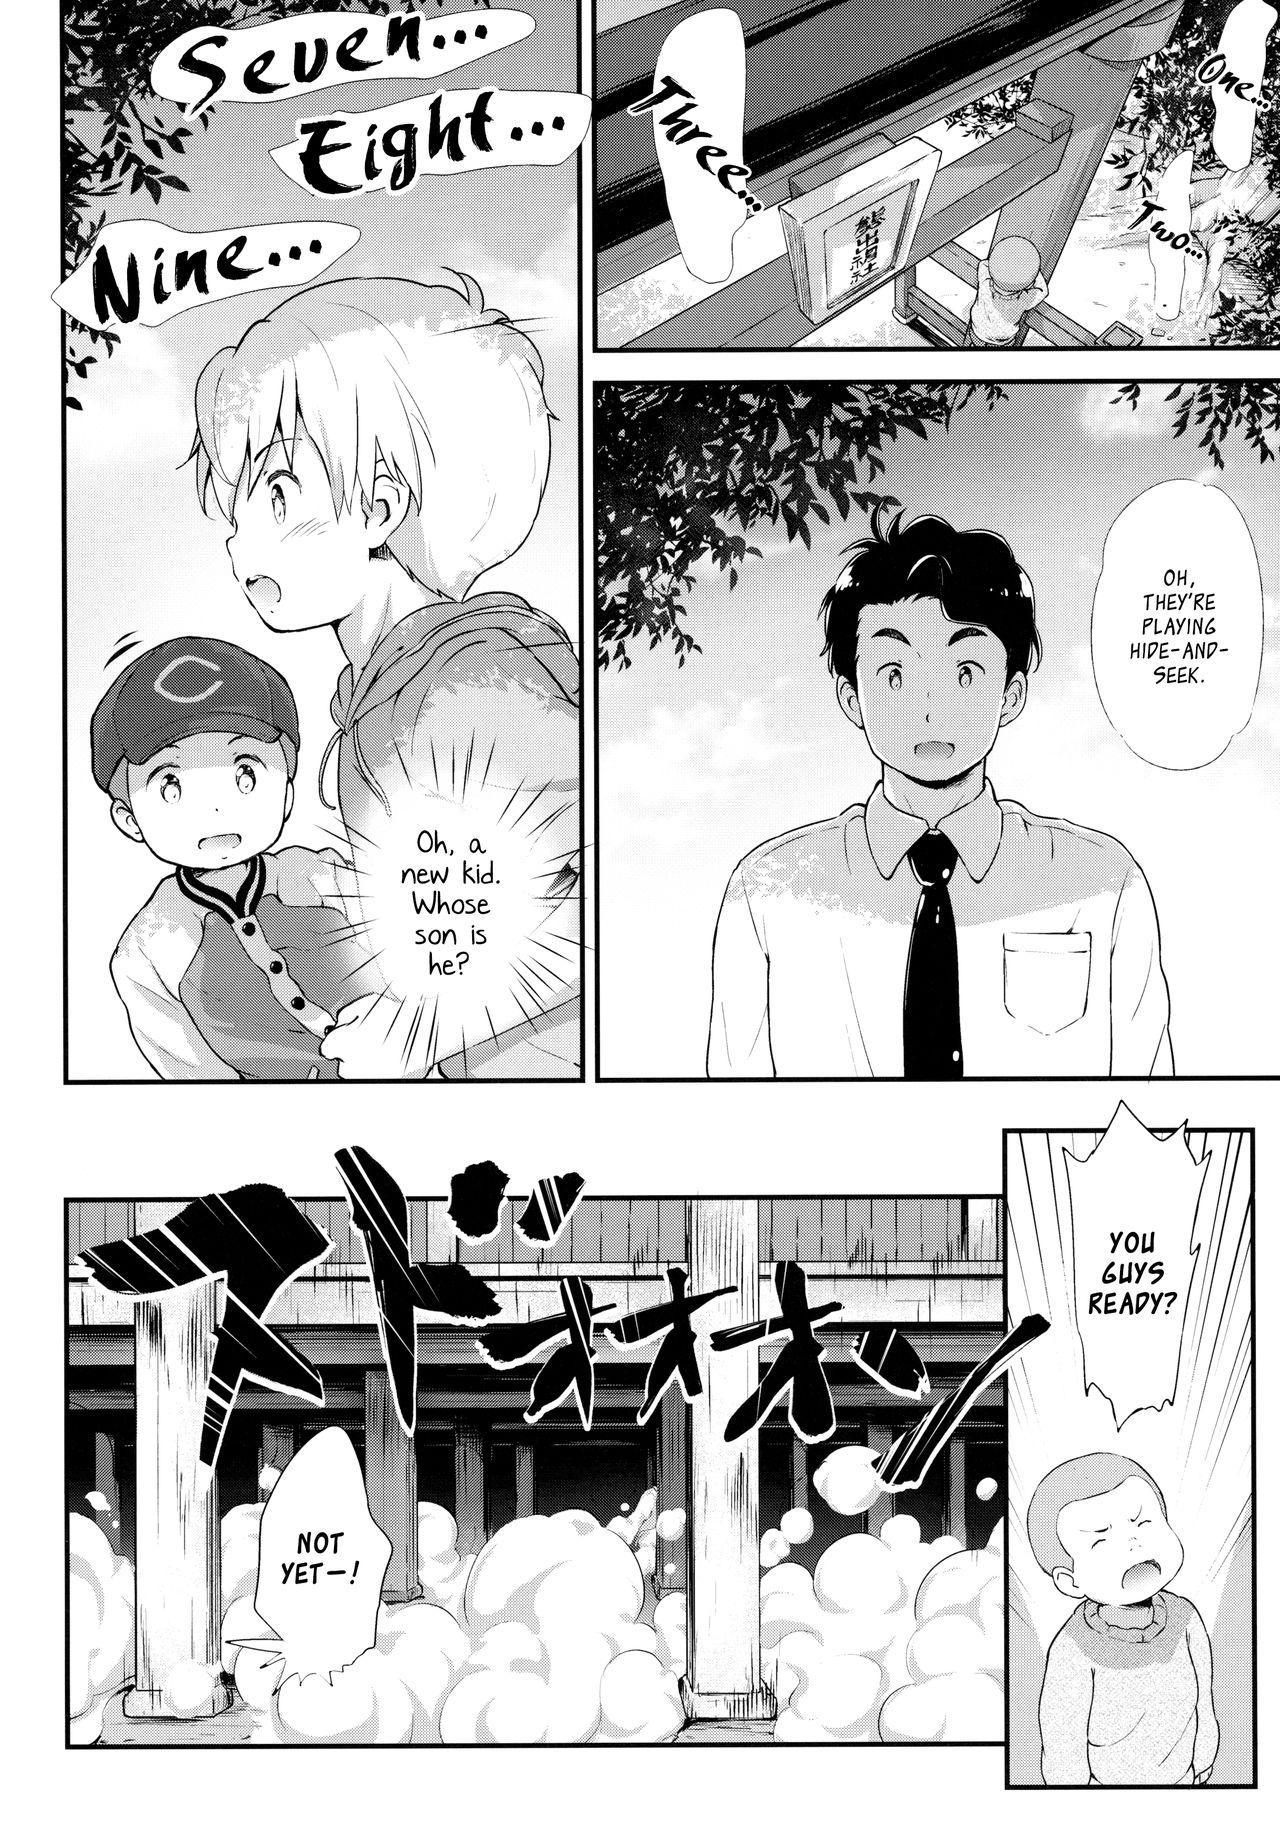 (C90) [Argyle check, Wanton Land Kumiai (Komame Maru)] Toro Musume 10 Machi-chan Psychopath Kawaii!!   Machi-chan is a Cute Psychopath!! (Kuma Miko) [English] [gravity666] 2